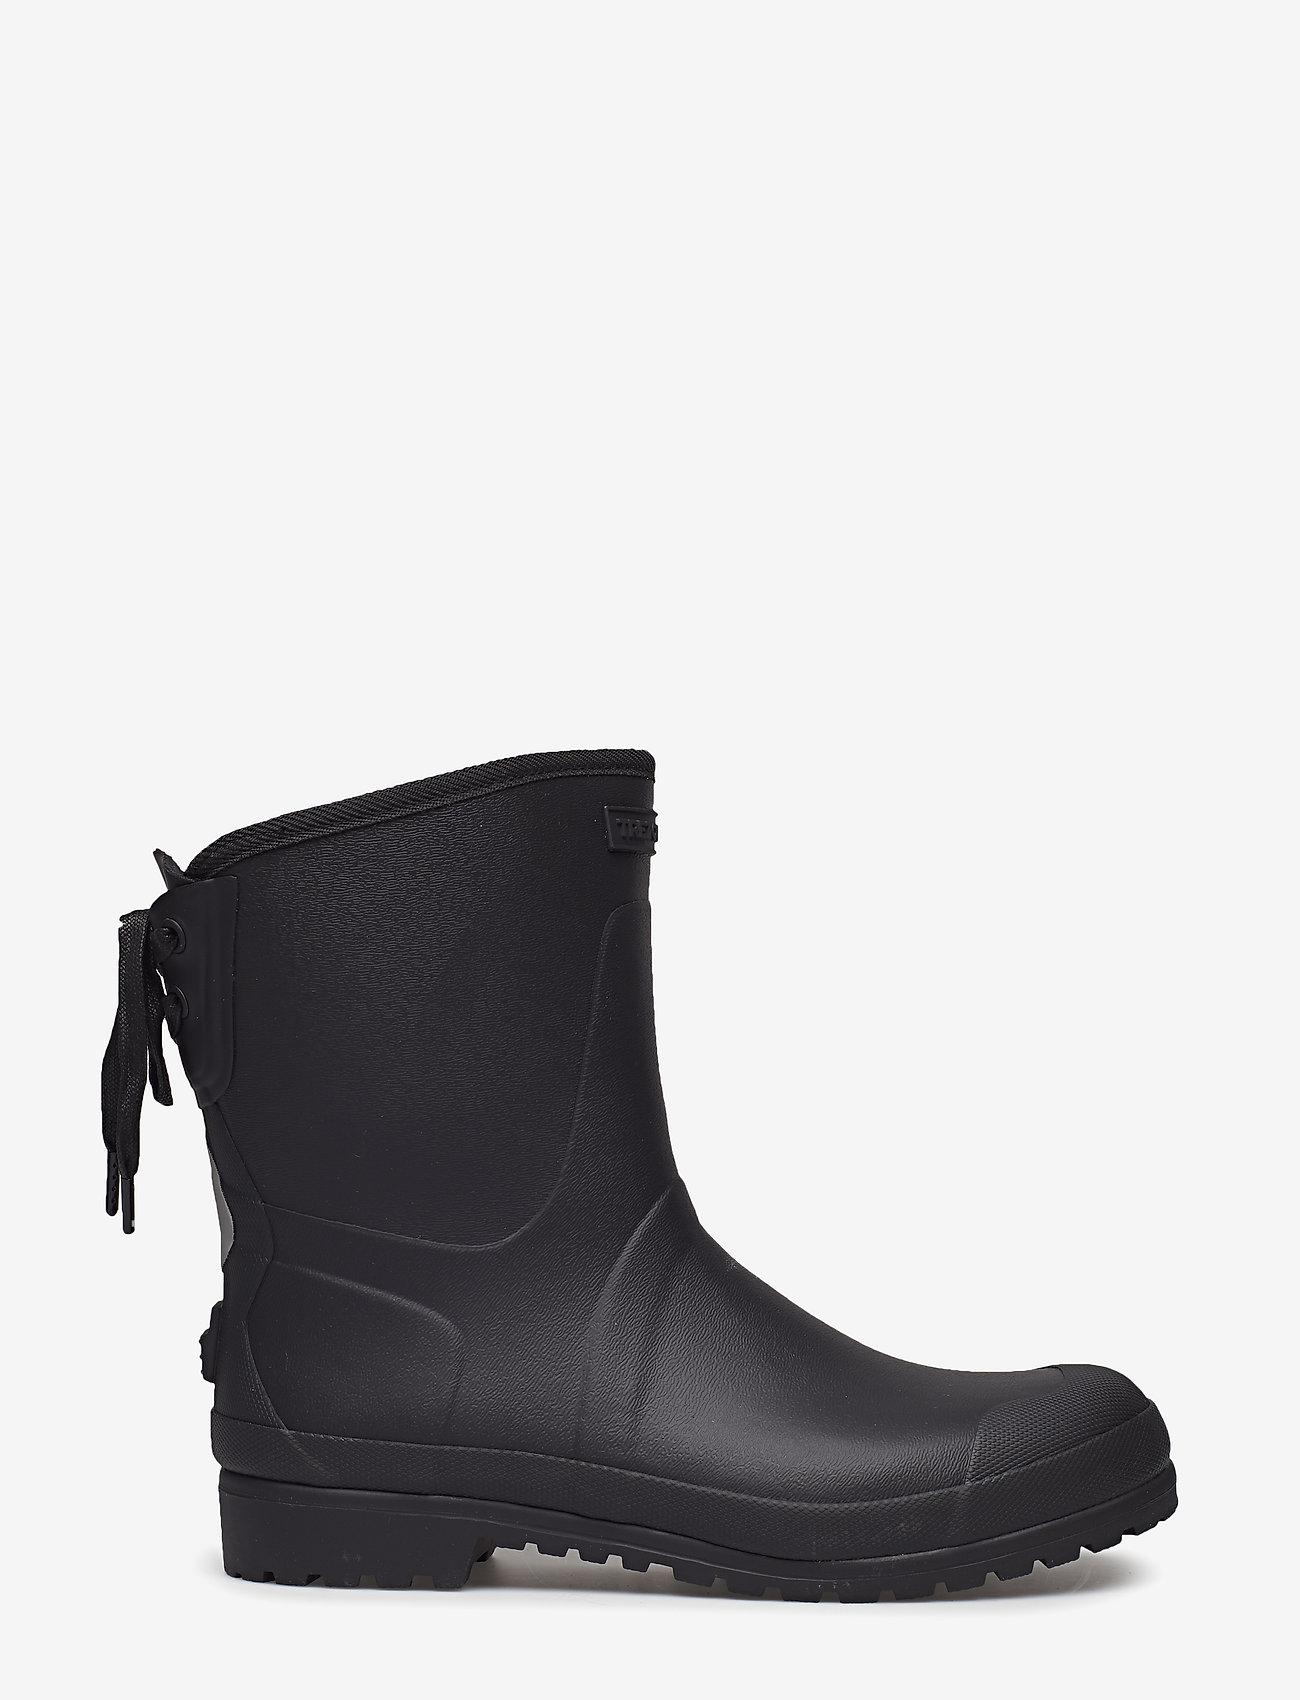 Tretorn - REDO 2.0 - rain boots - 010/black - 1